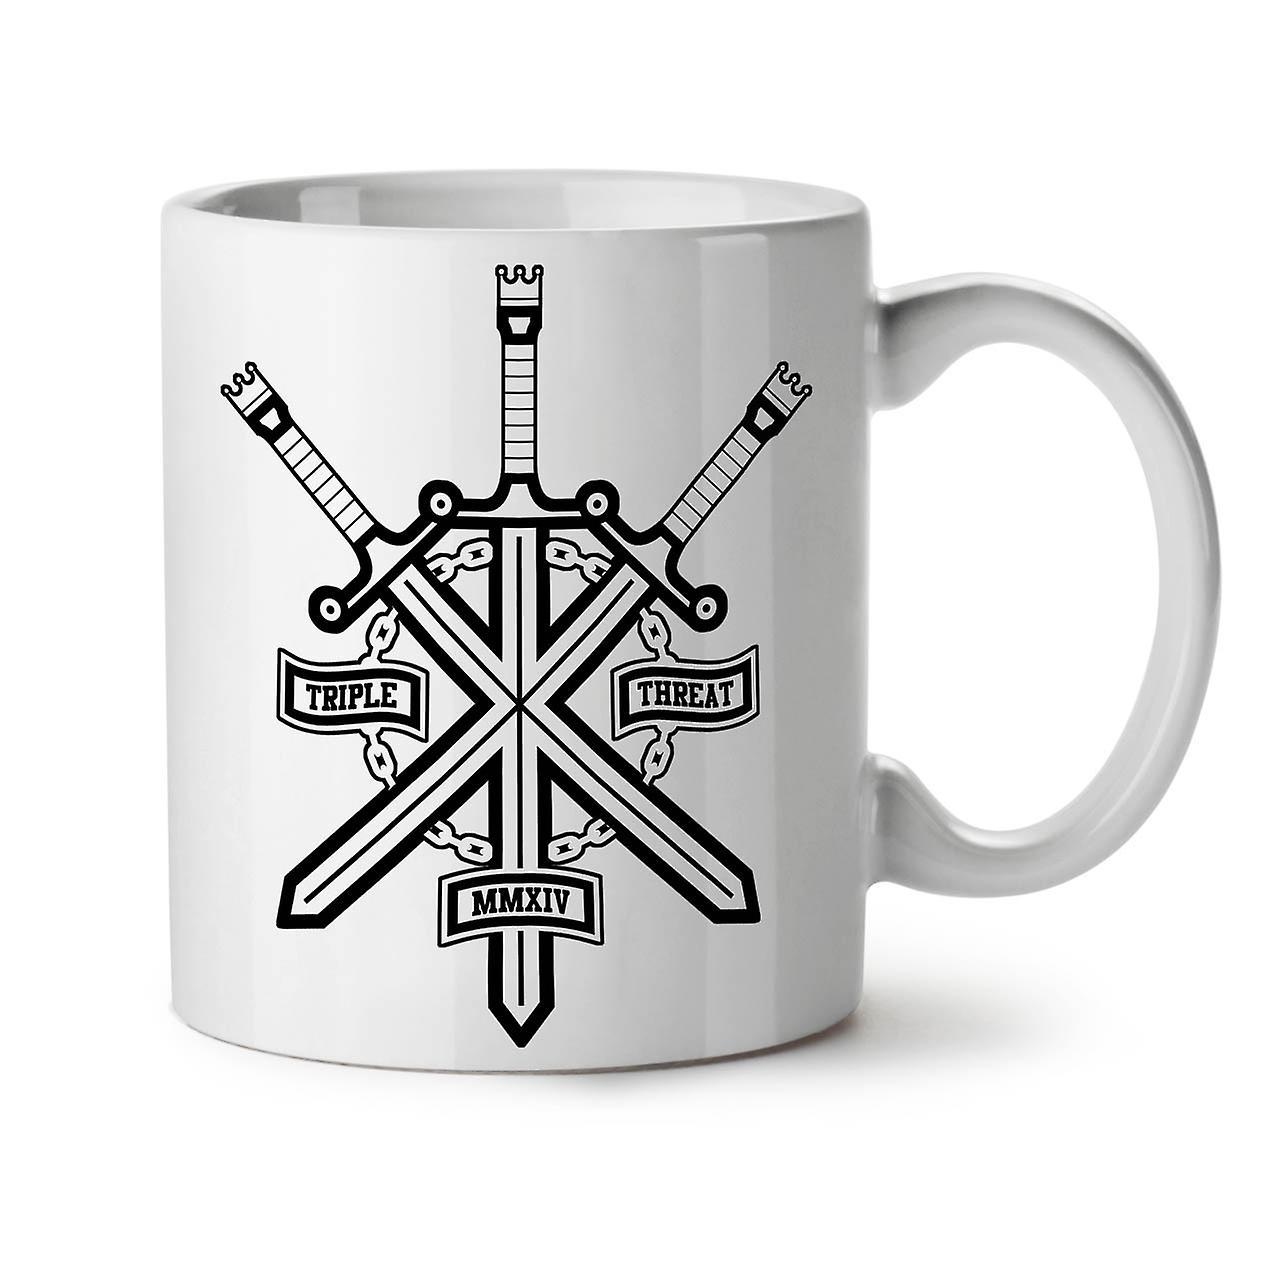 Triple Sword Tea Coffee Geek White OzWellcoda New 11 Ceramic Mug OPZTlkiwXu